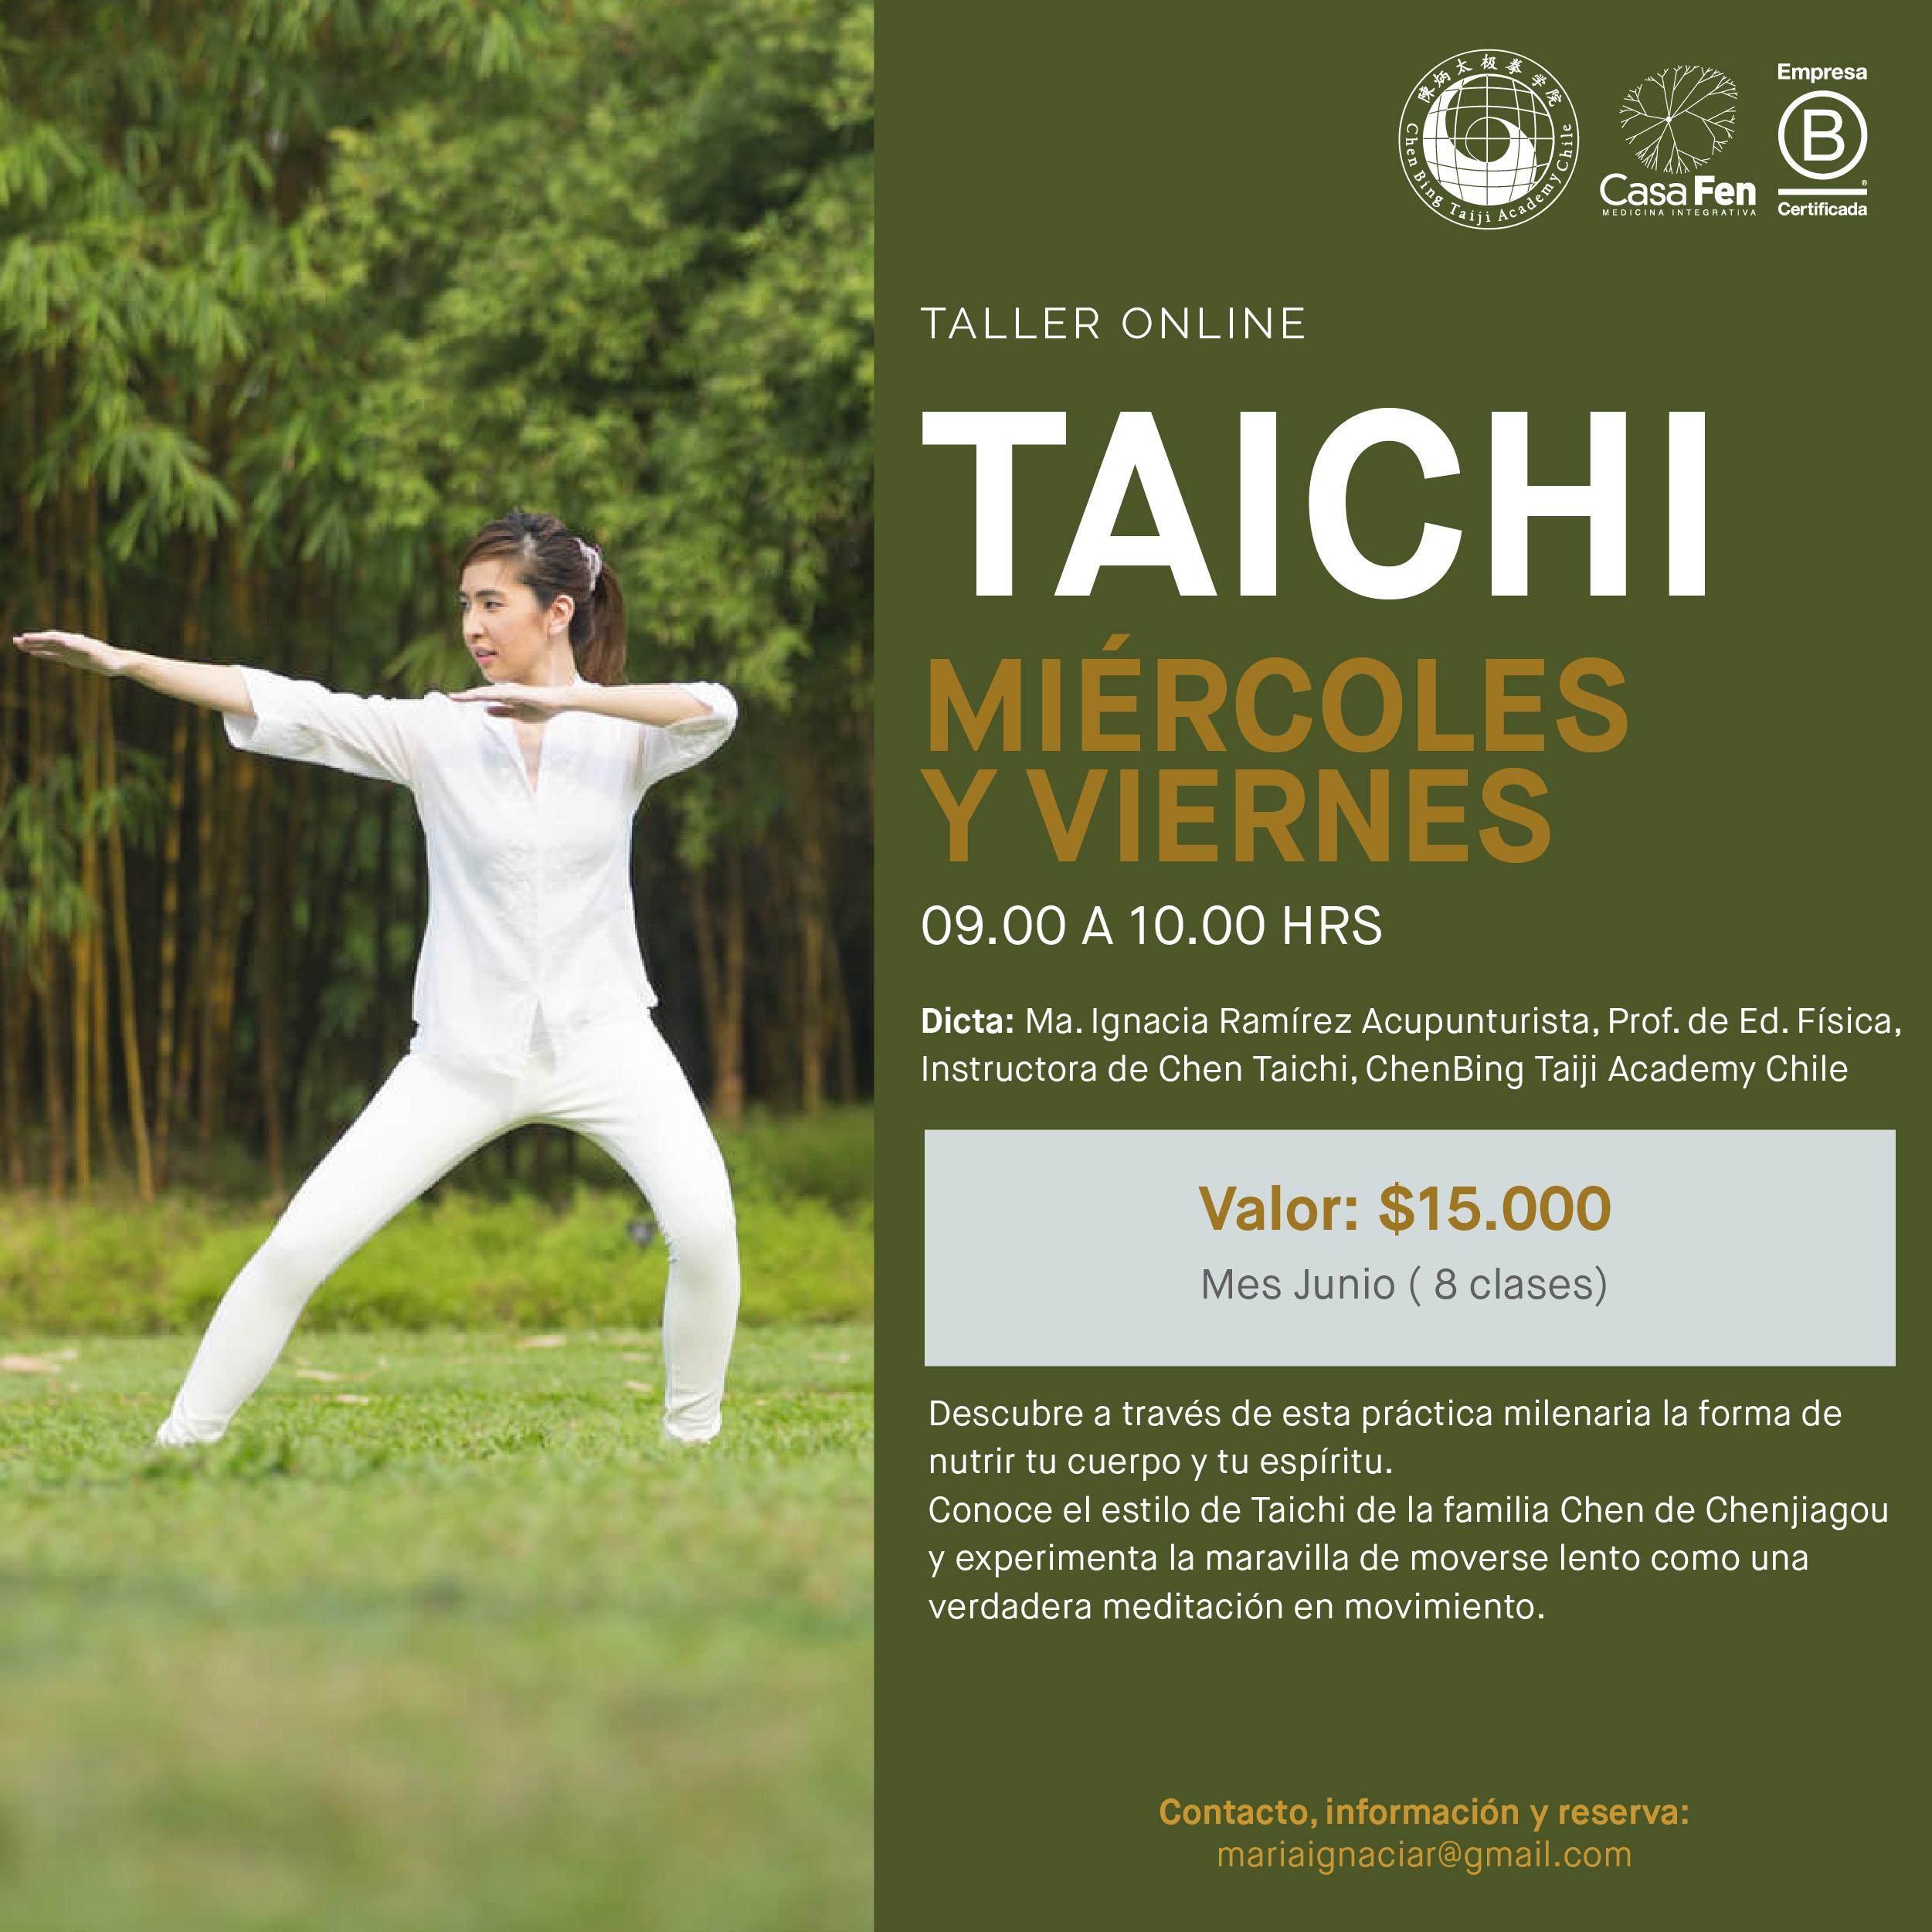 Taller Taichi-CasaFen